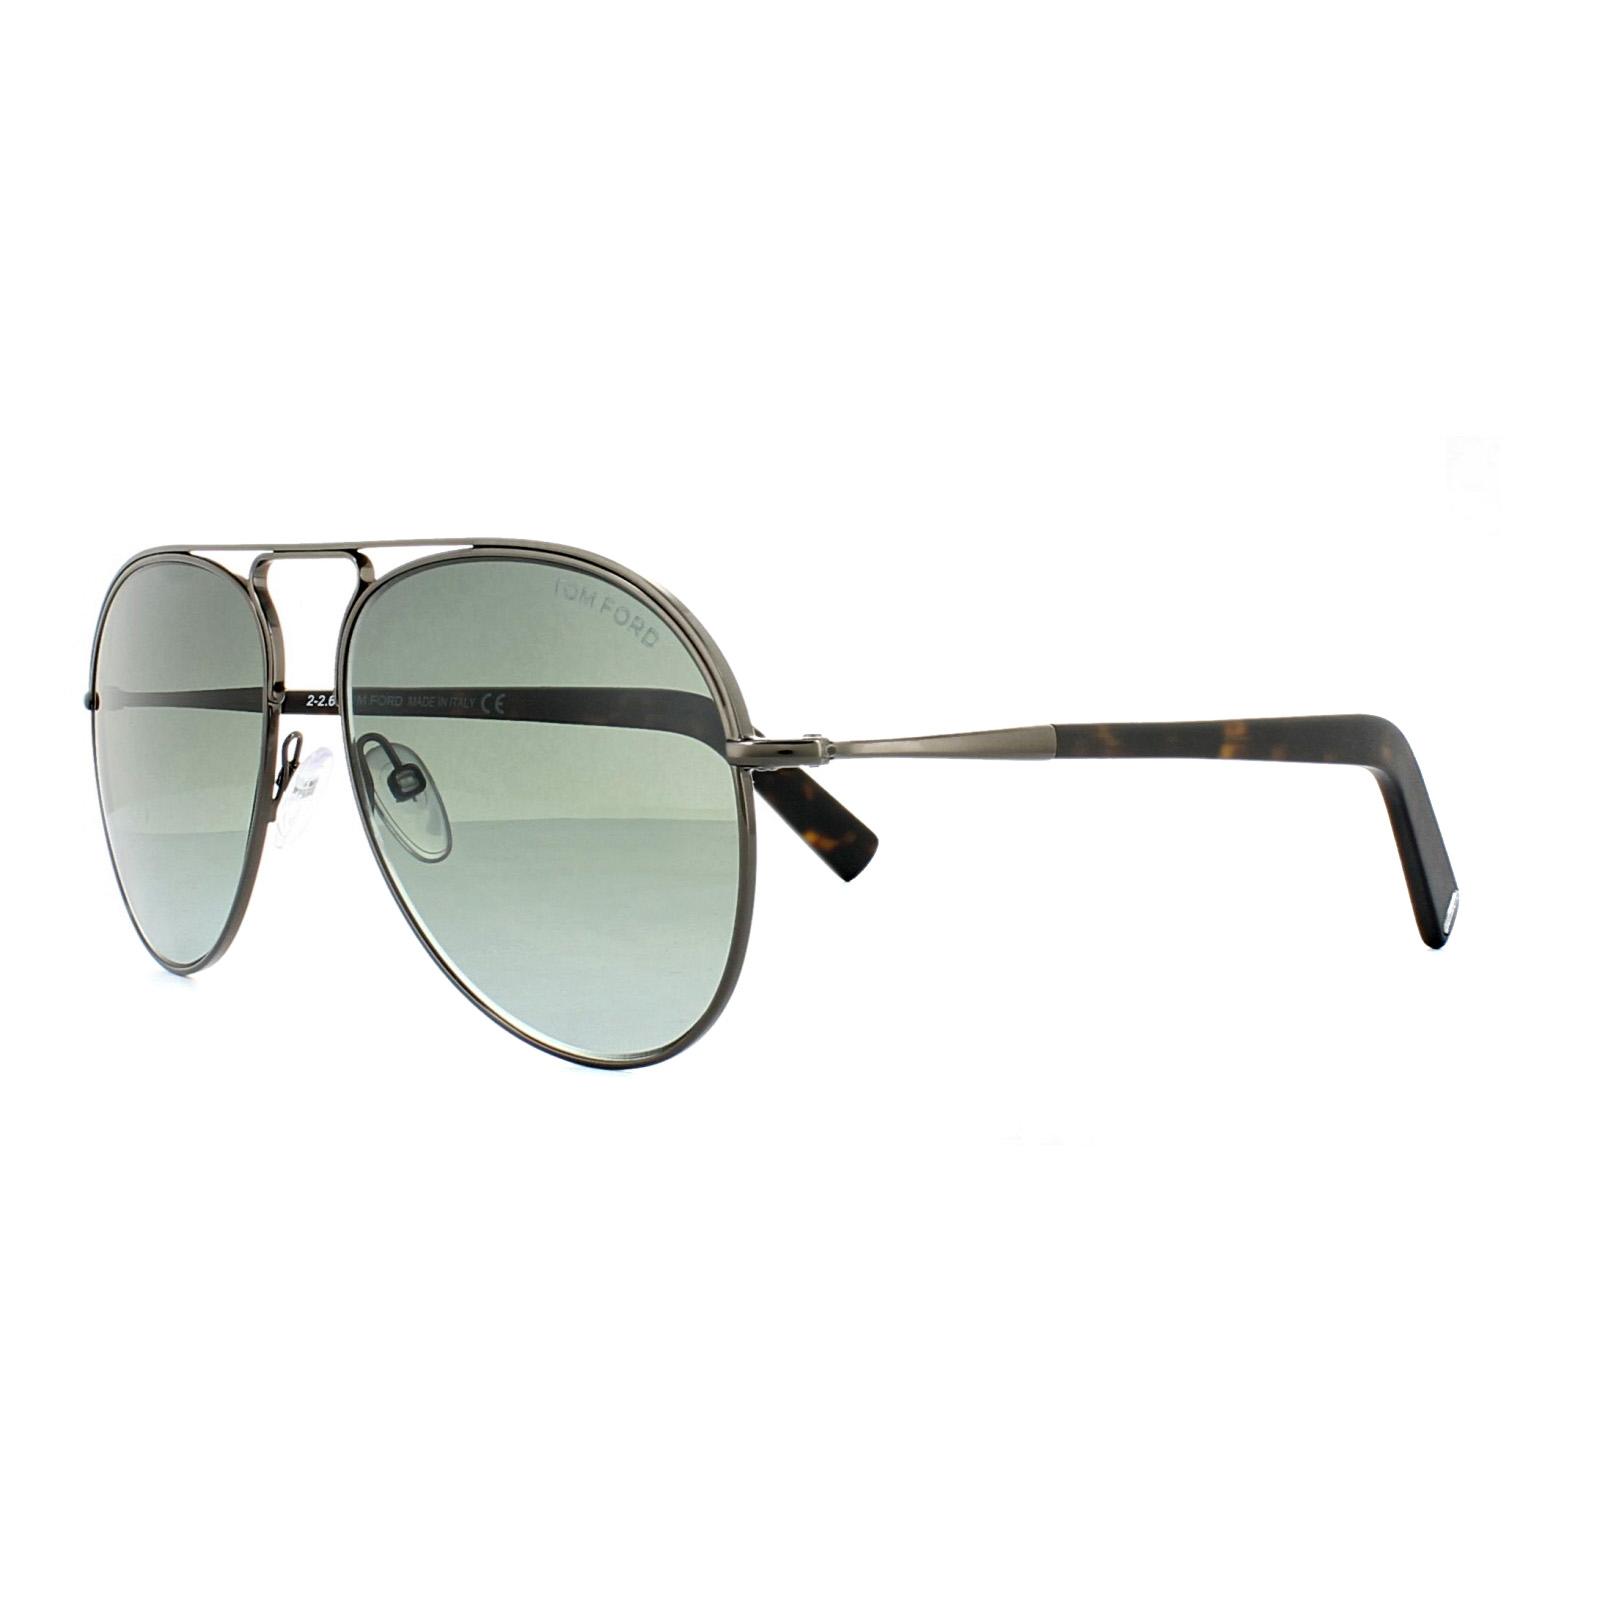 f7091ce00028 Cheap Tom Ford 0448 Cody Sunglasses - Discounted Sunglasses